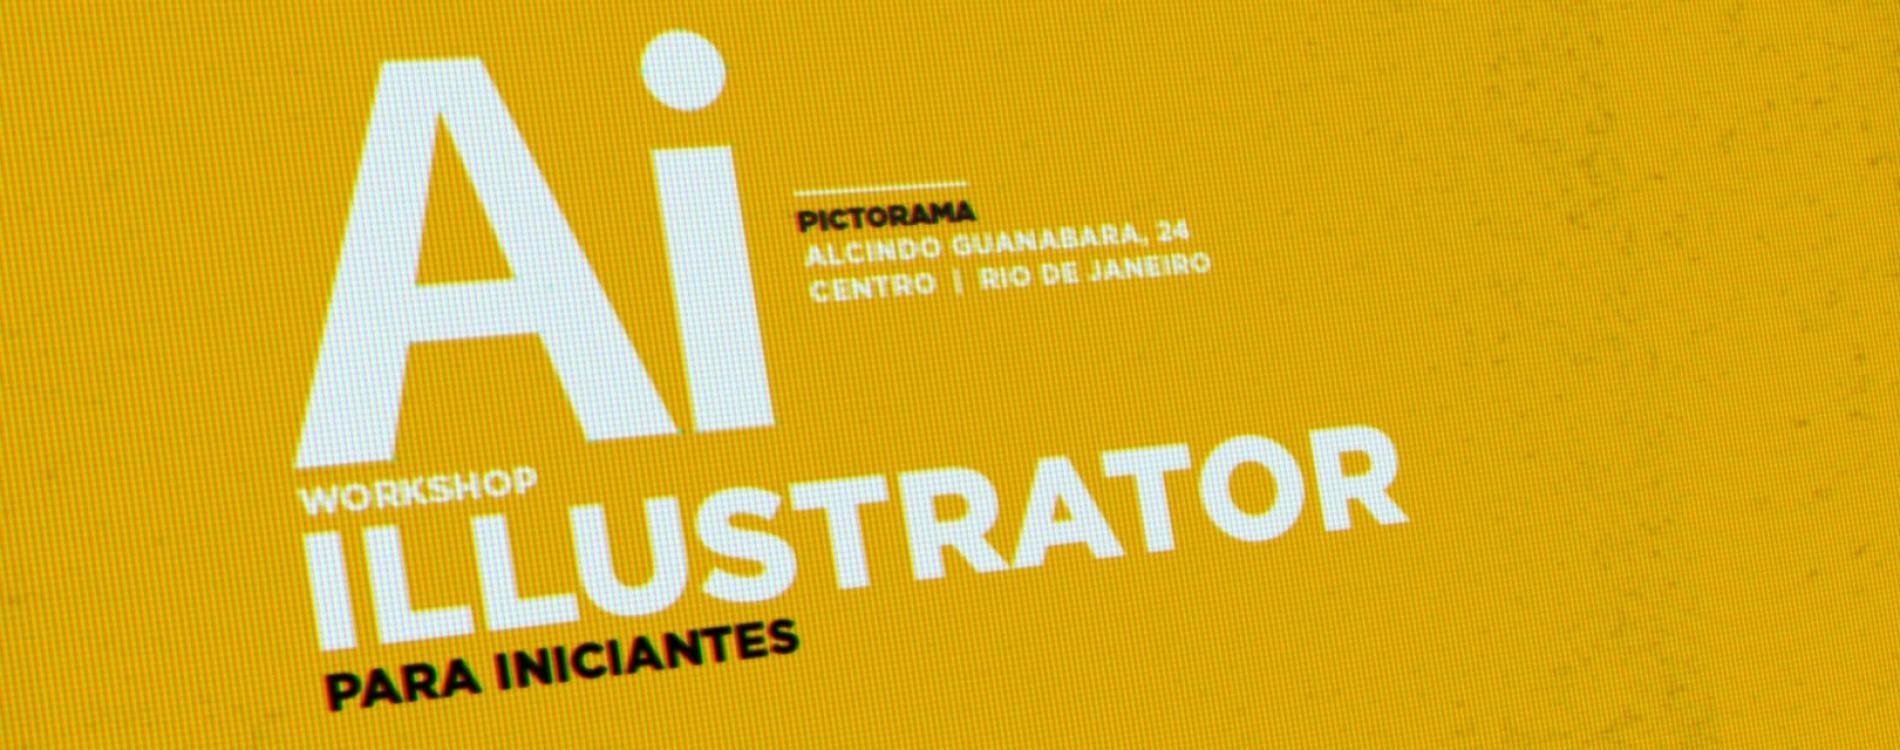 Curso Illustrator para Iniciantes